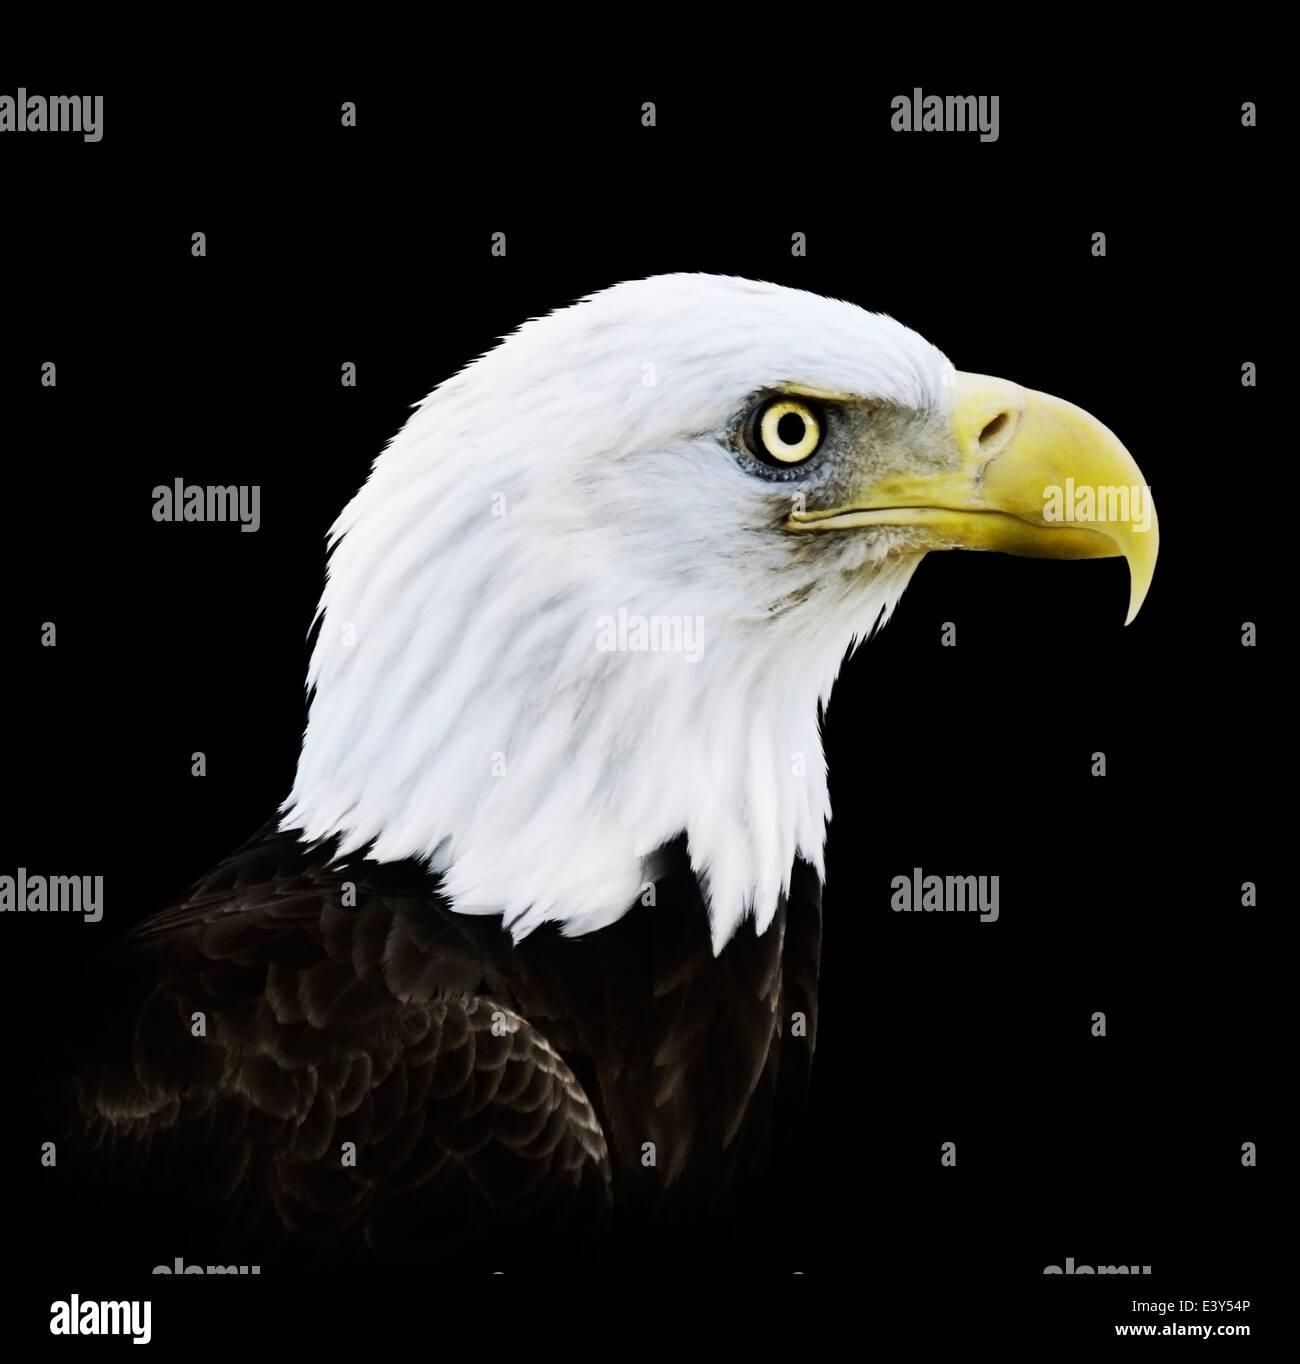 Retrato de águila calva sobre fondo negro Imagen De Stock